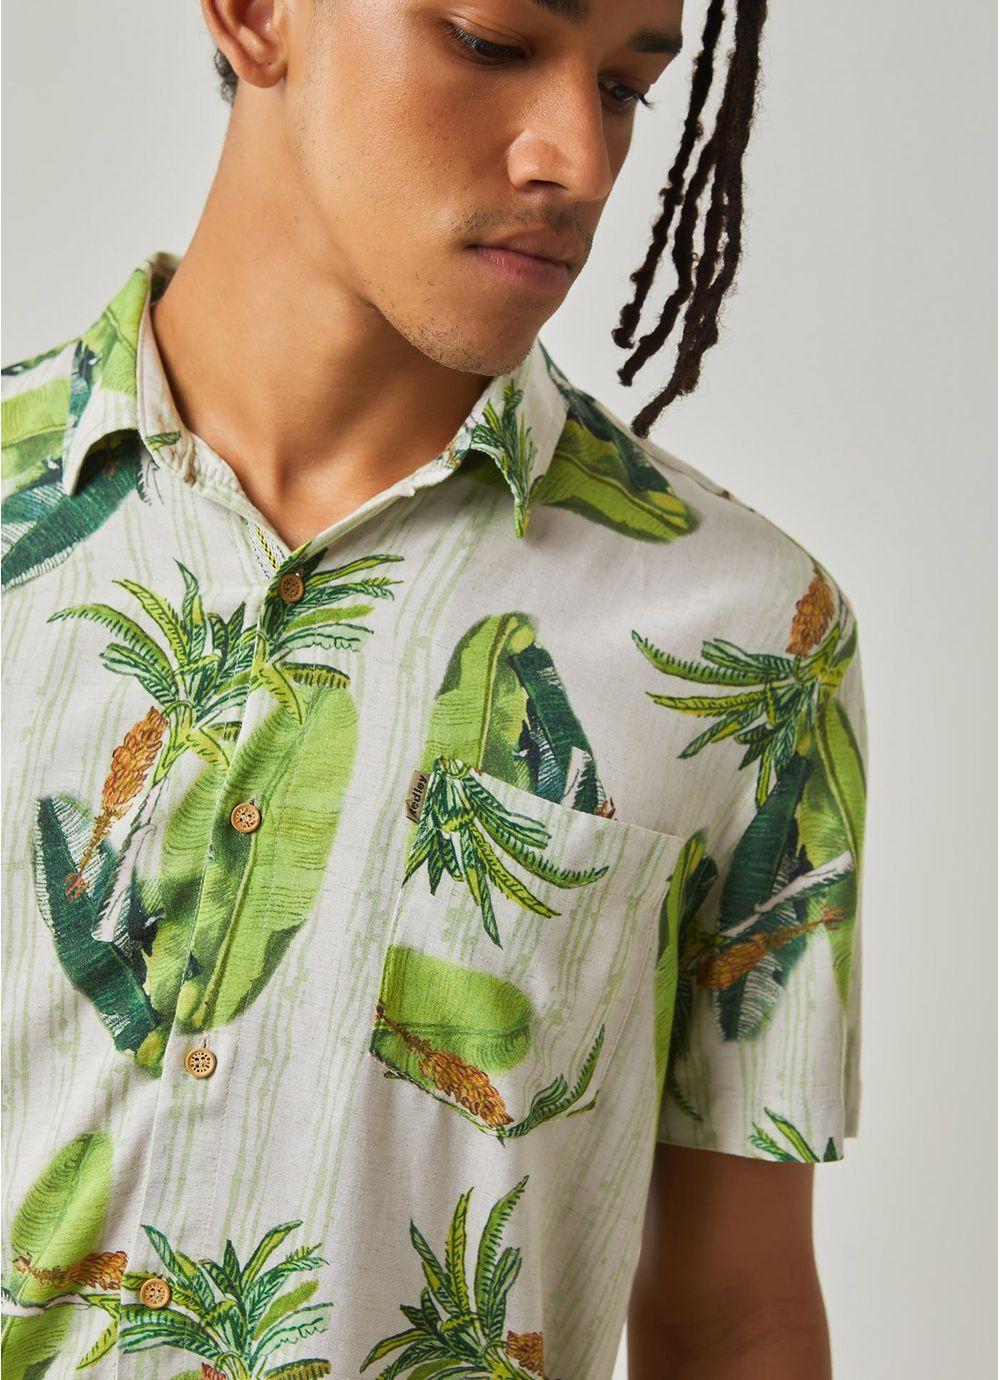 c1d17d805d camisa manga curta estampada bananeiras BRANCO - Compre Online na ...